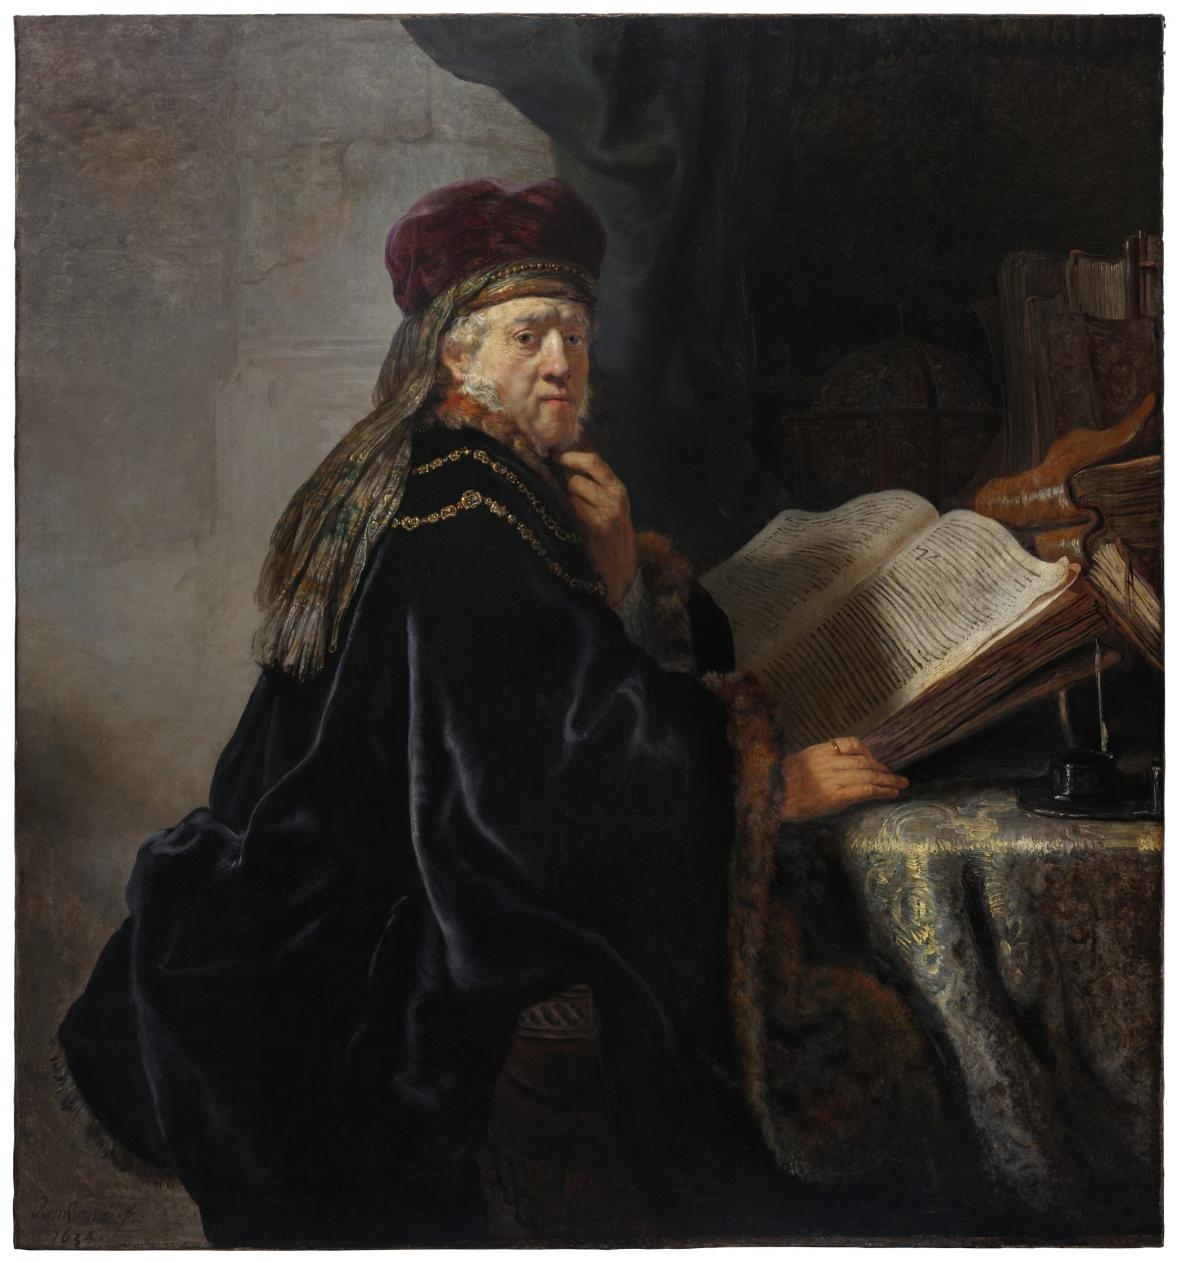 Rembrandt van Rijn / Učenec ve studovně, 1634